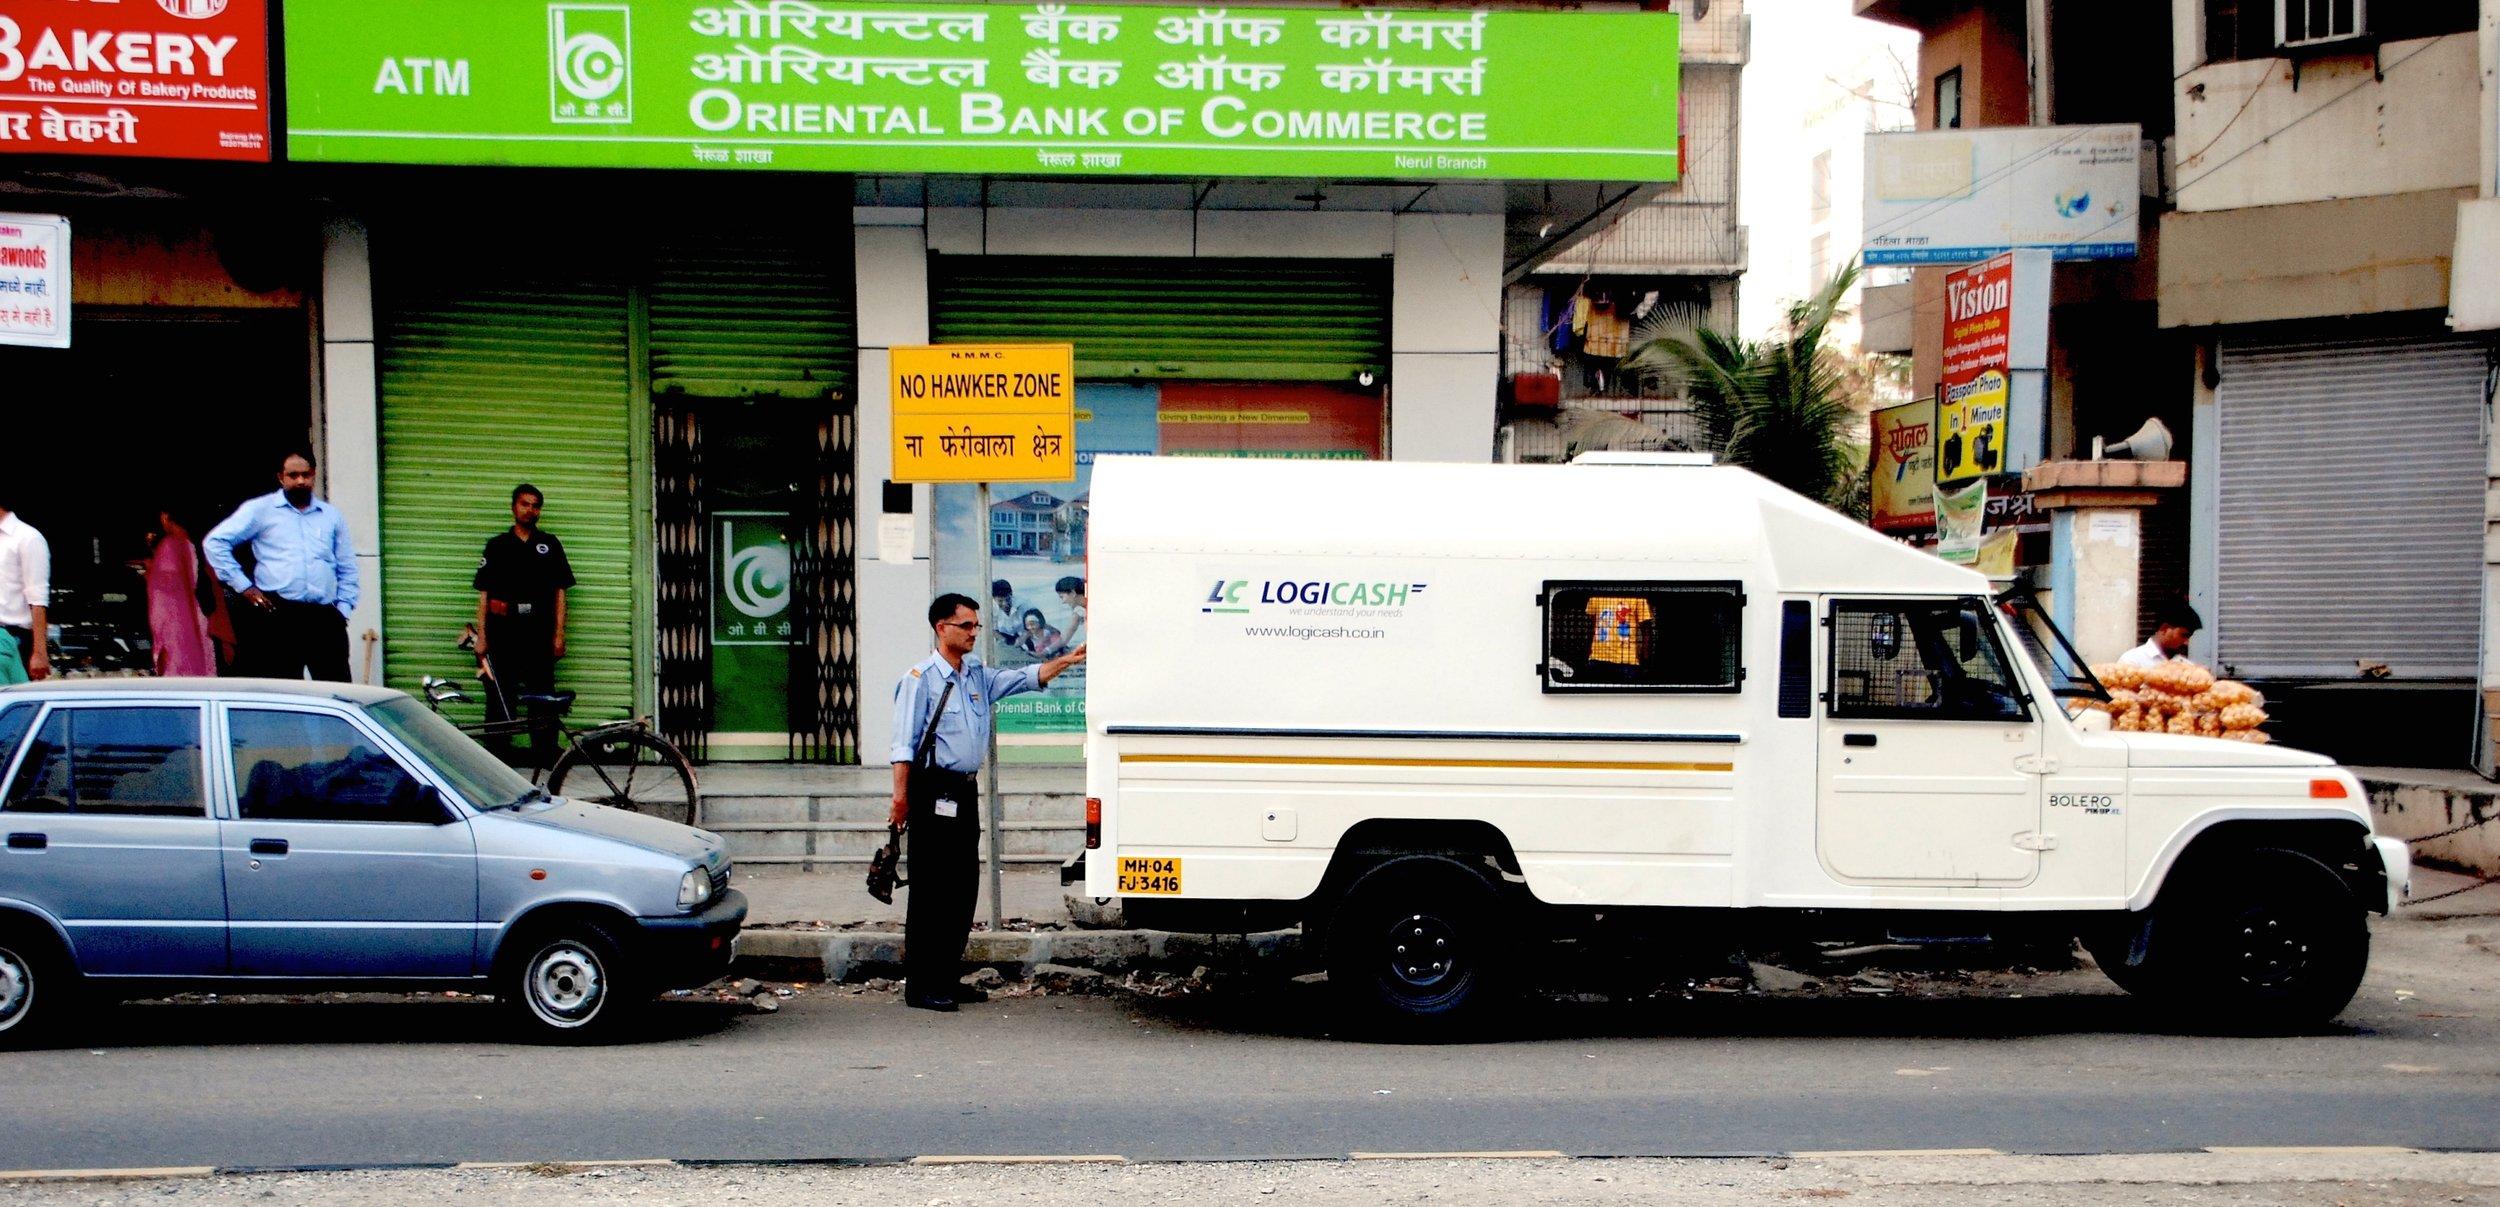 Medewerker LogiCash vult pinautomaat bij in India (foto: LogiCash